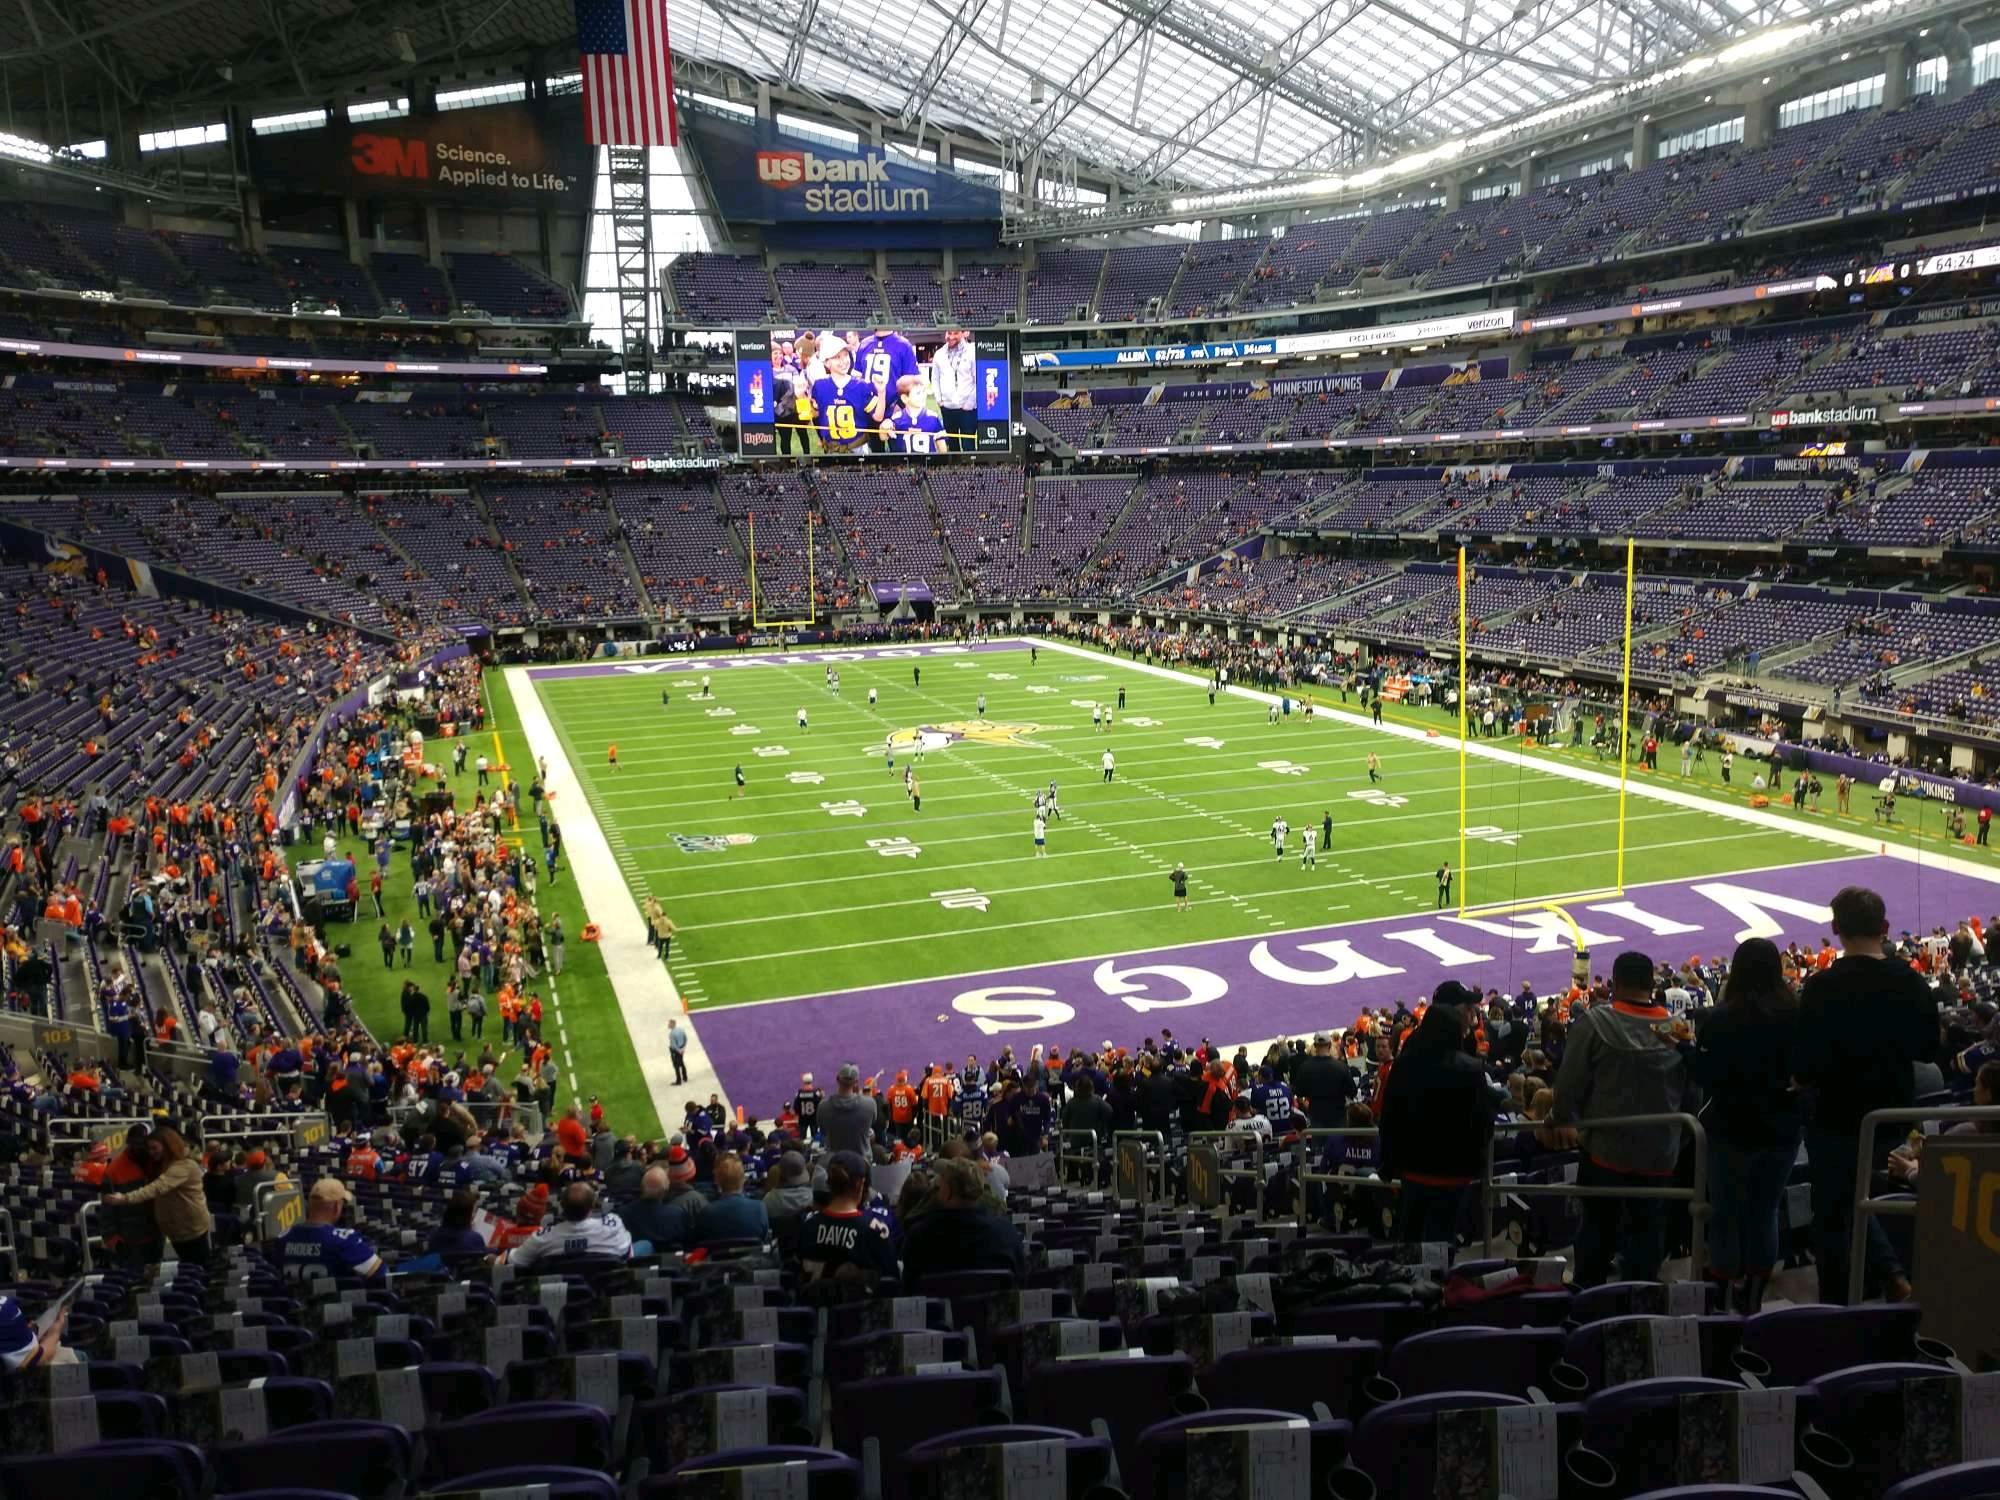 U.S. Bank Stadium Section 101 Row 37 Seat 7